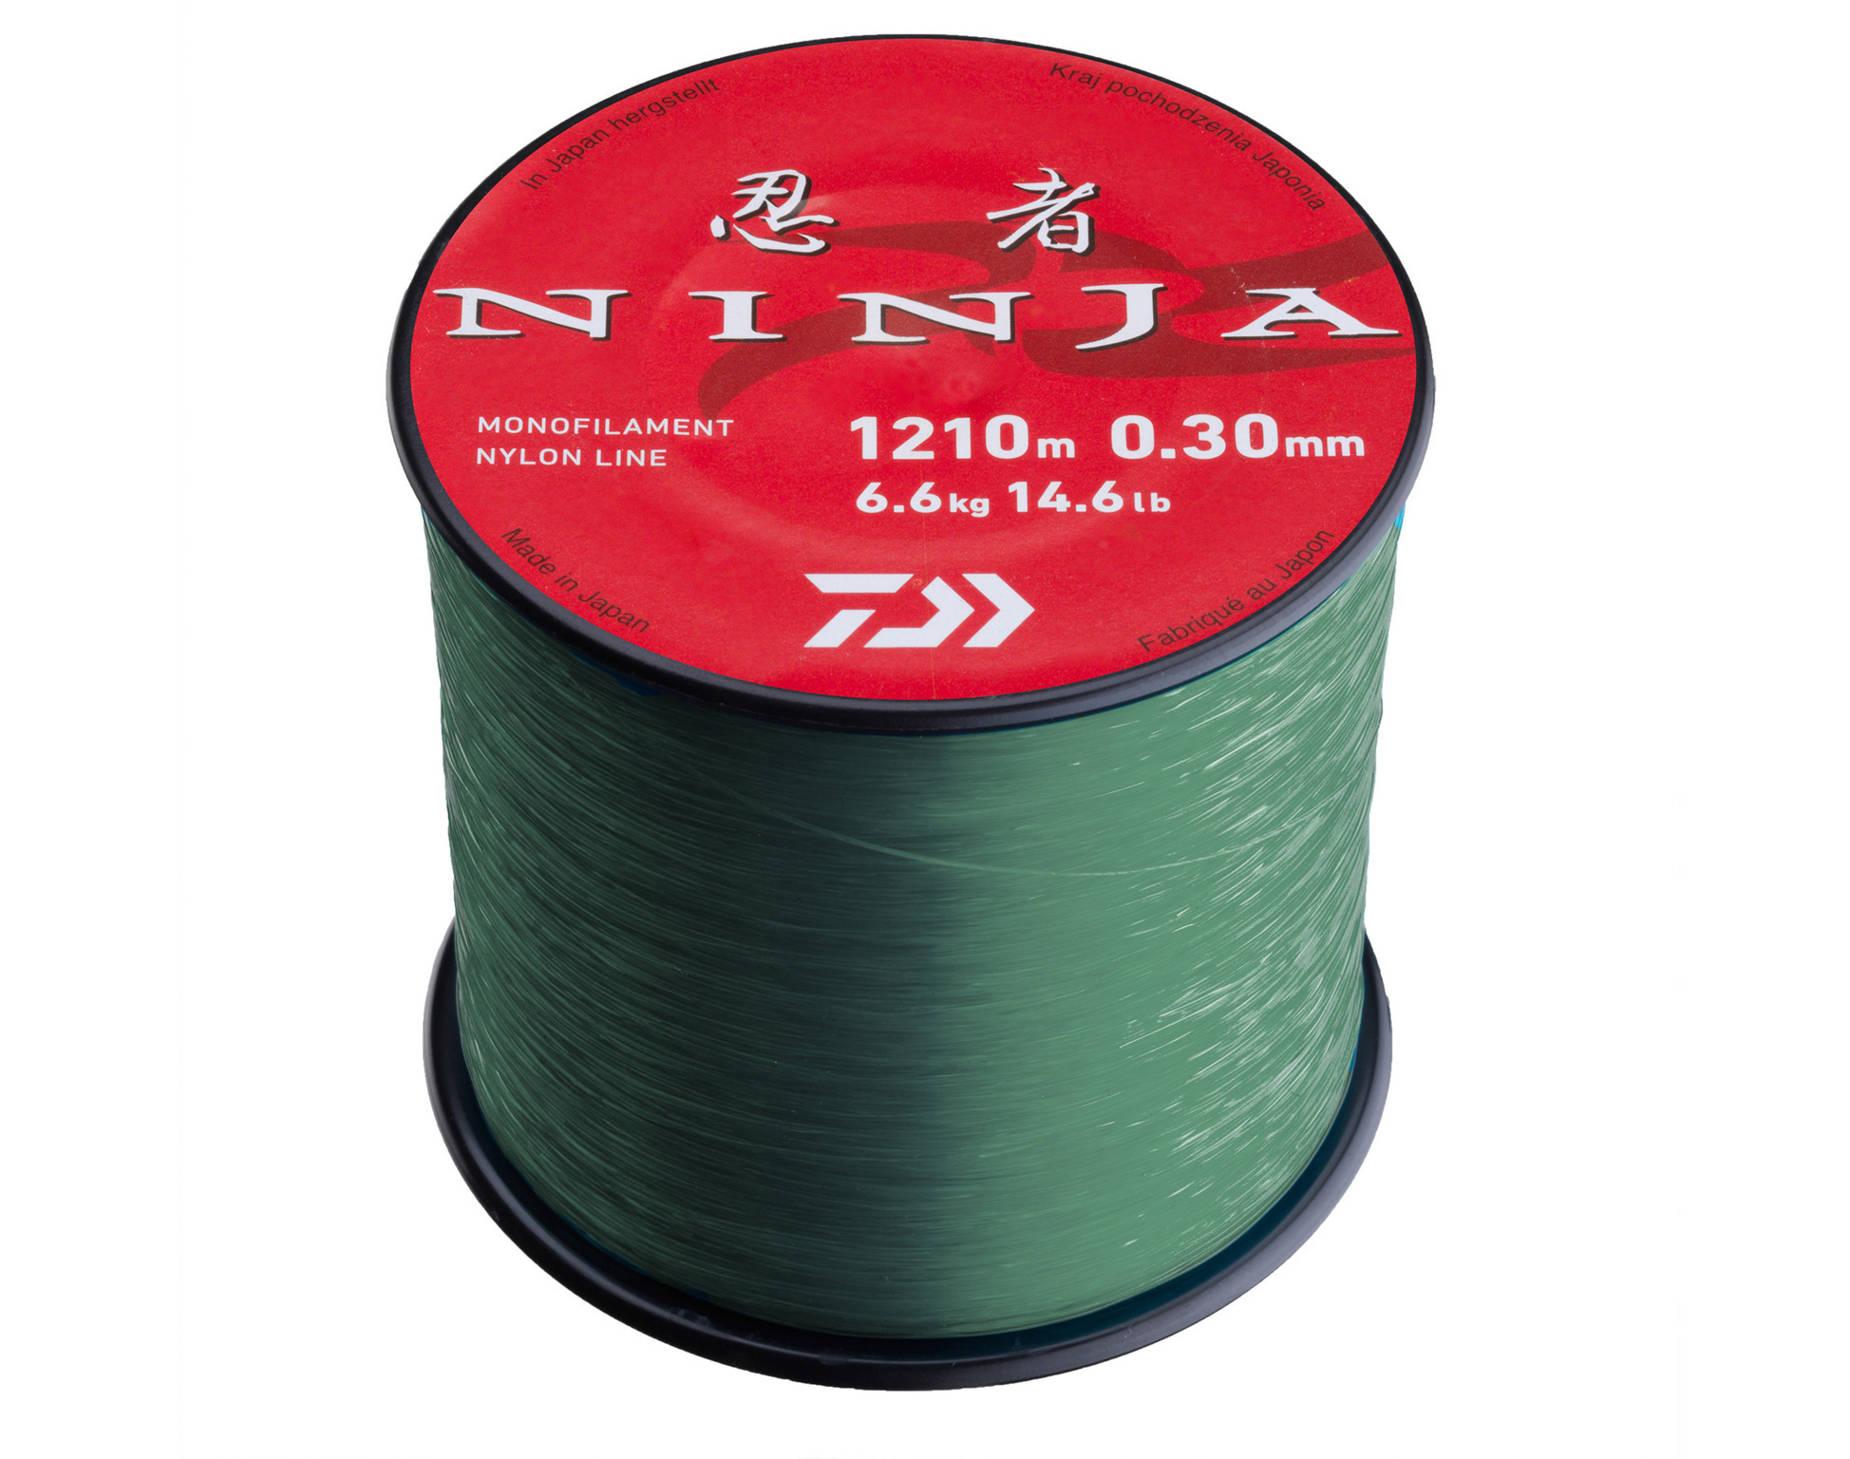 12991-036 - Daiwa ¯y³ka Ninja X Mono - 840m 0.36mm 9.2kg